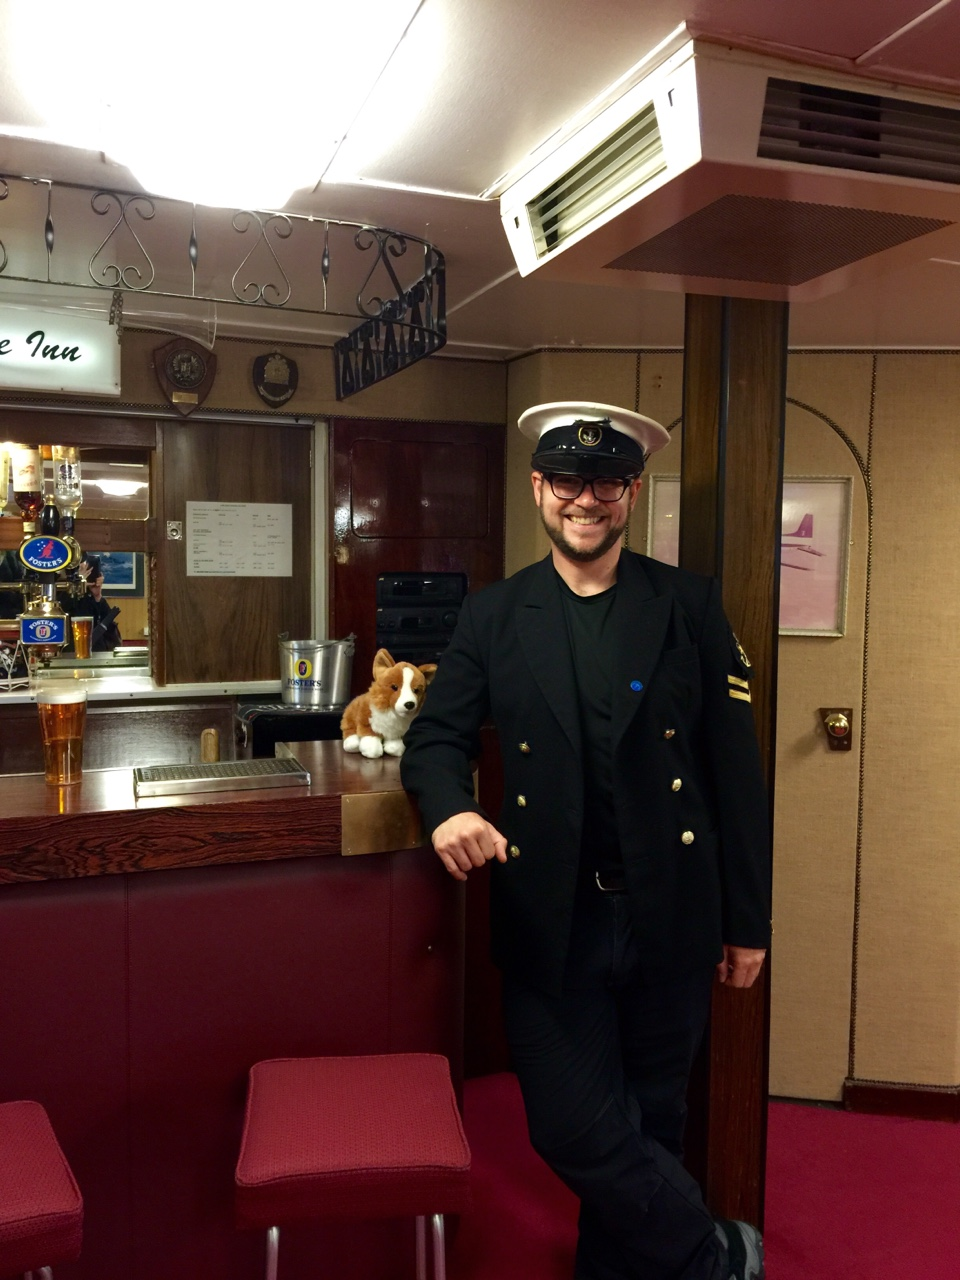 Edinburgh, Scotland    Manning the bar from the Royal Yacht Brittania with my trusty stuffed corgi, Scruffles.